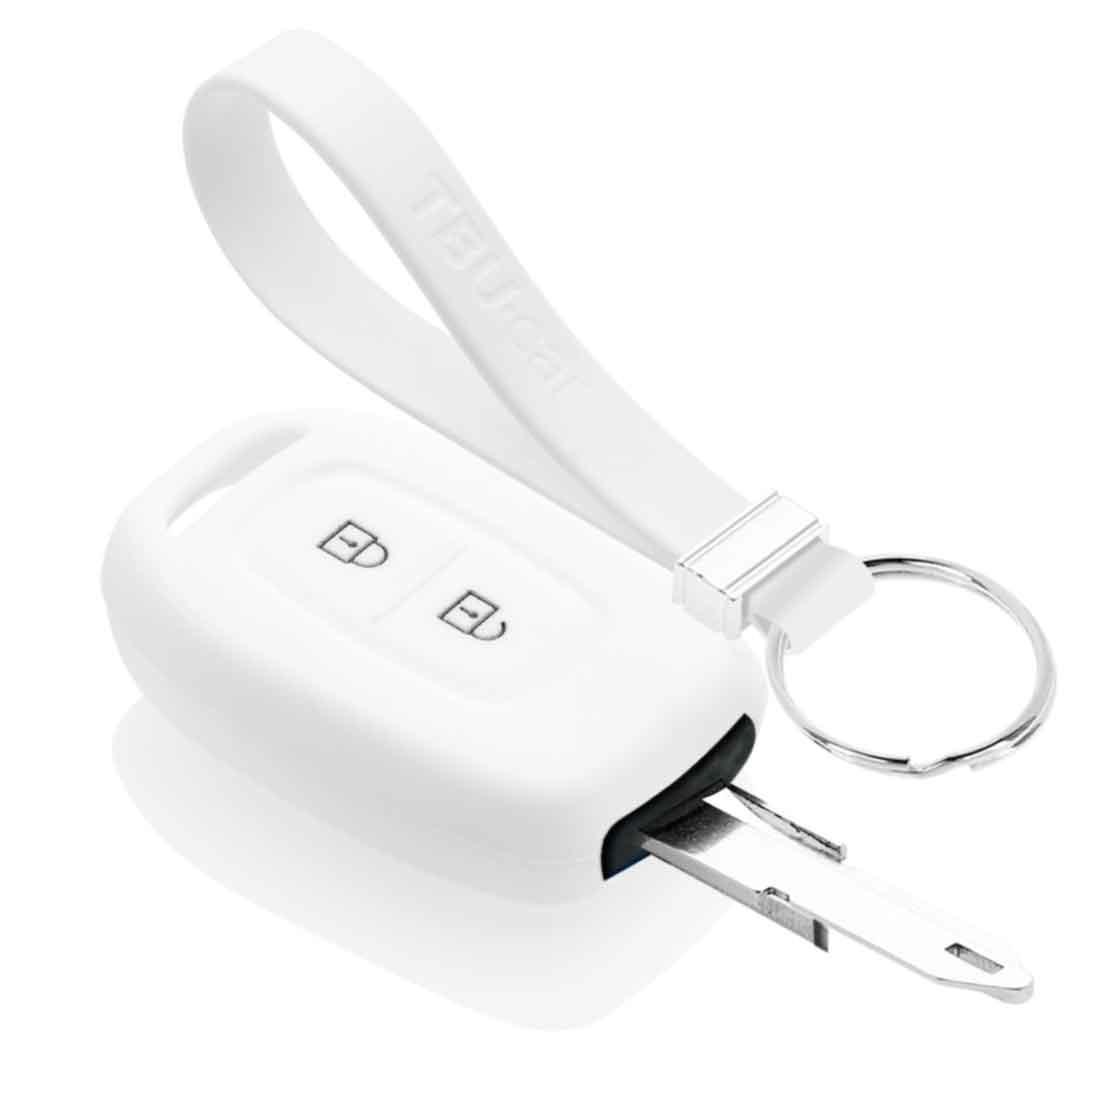 TBU car TBU car Autoschlüssel Hülle kompatibel mit Dacia 2 Tasten - Schutzhülle aus Silikon - Auto Schlüsselhülle Cover in Weiß